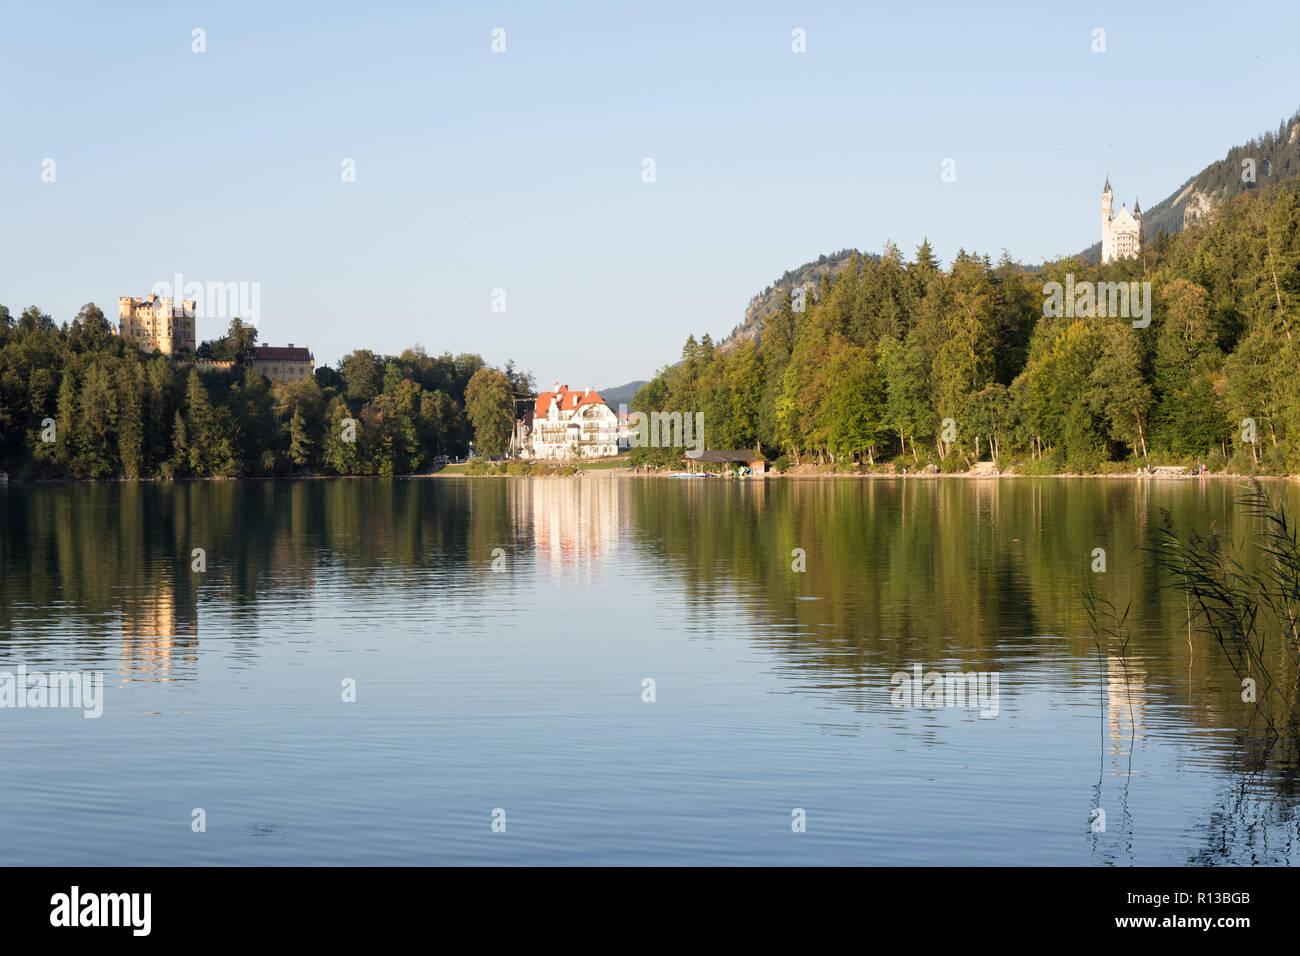 Lake Alpsee, Füssen, with Hohenschwangau, Neuschwanstein, Restaurant Alpenrose am See on a warm sunny evening in late September. Schwangau, Bavaria - Stock Image